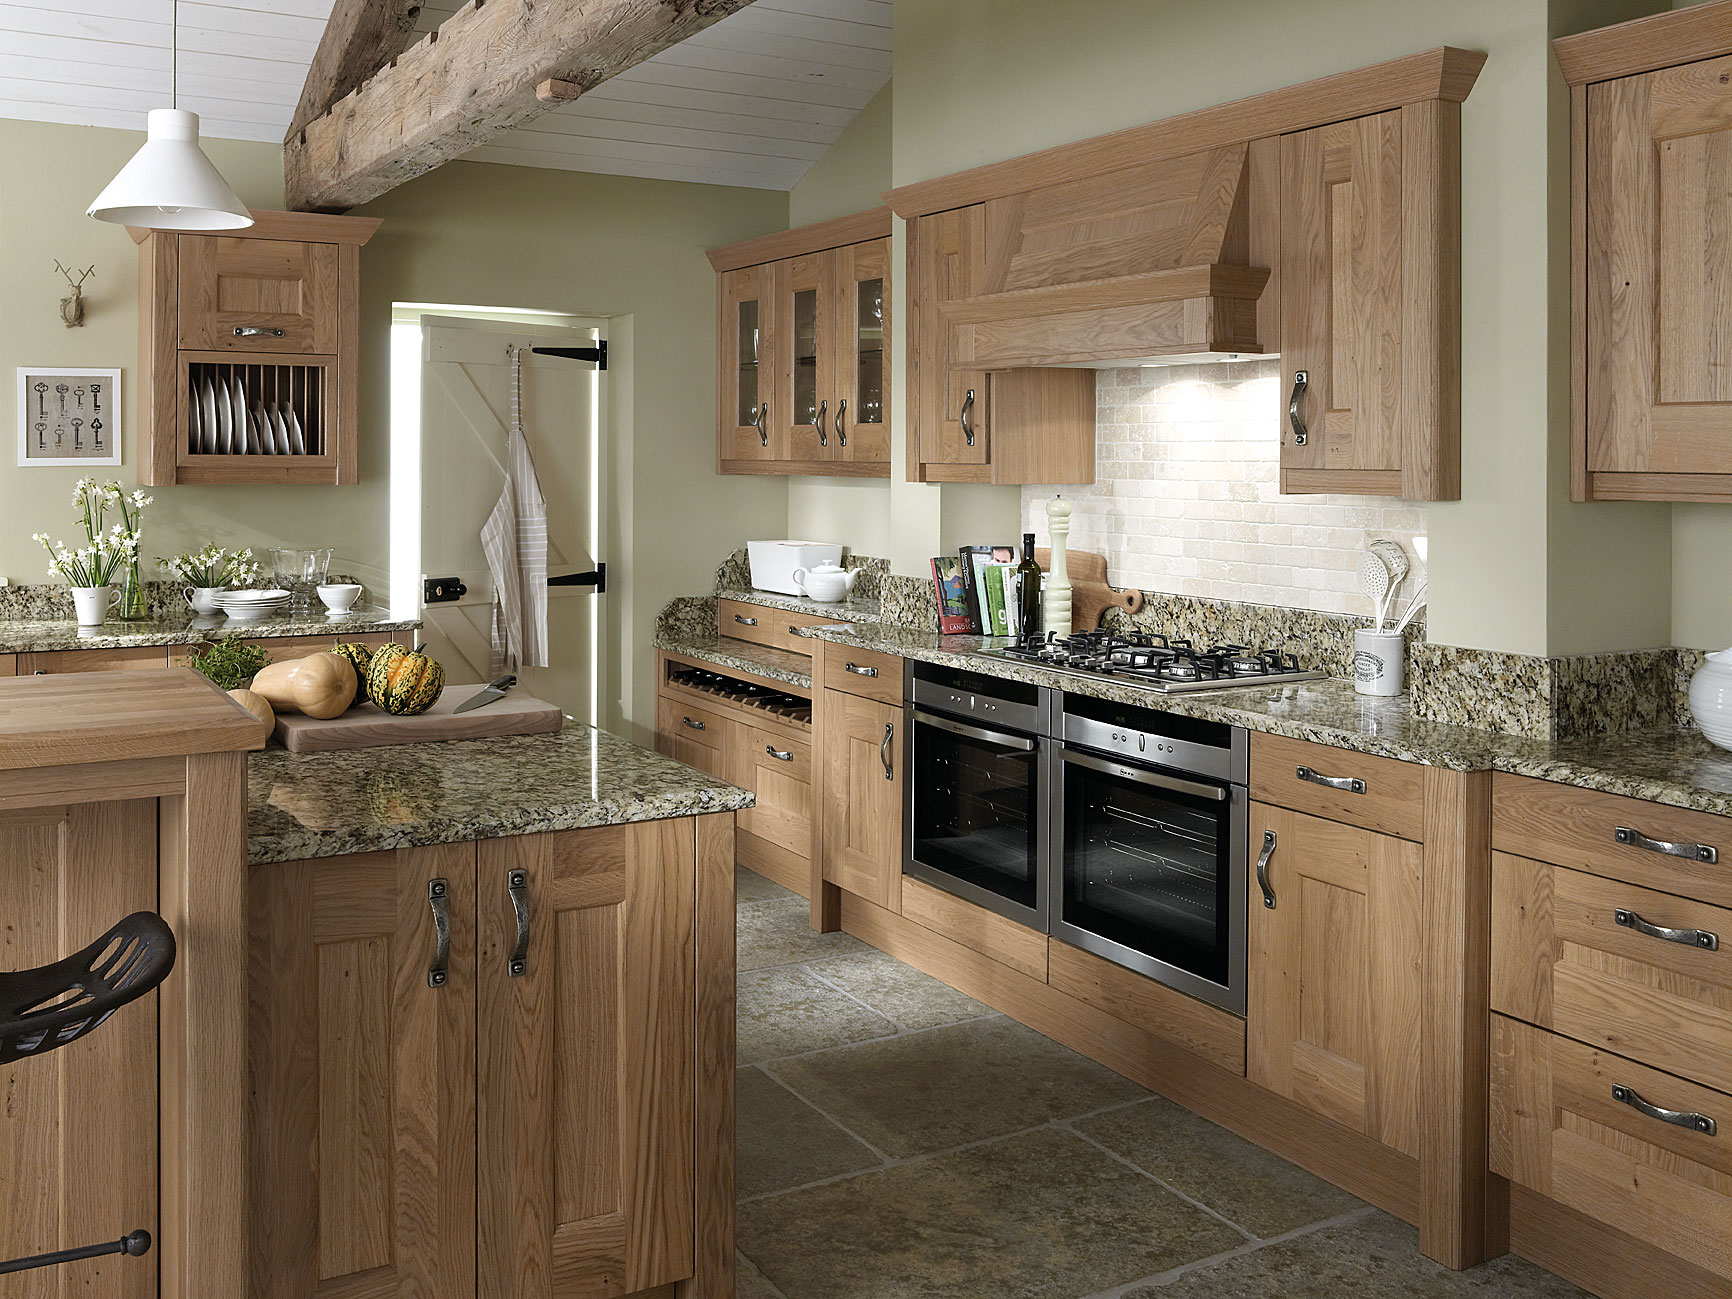 traditional kitchen design - oak kitchens - traditional ... on Traditional Kitchen Decor  id=57618